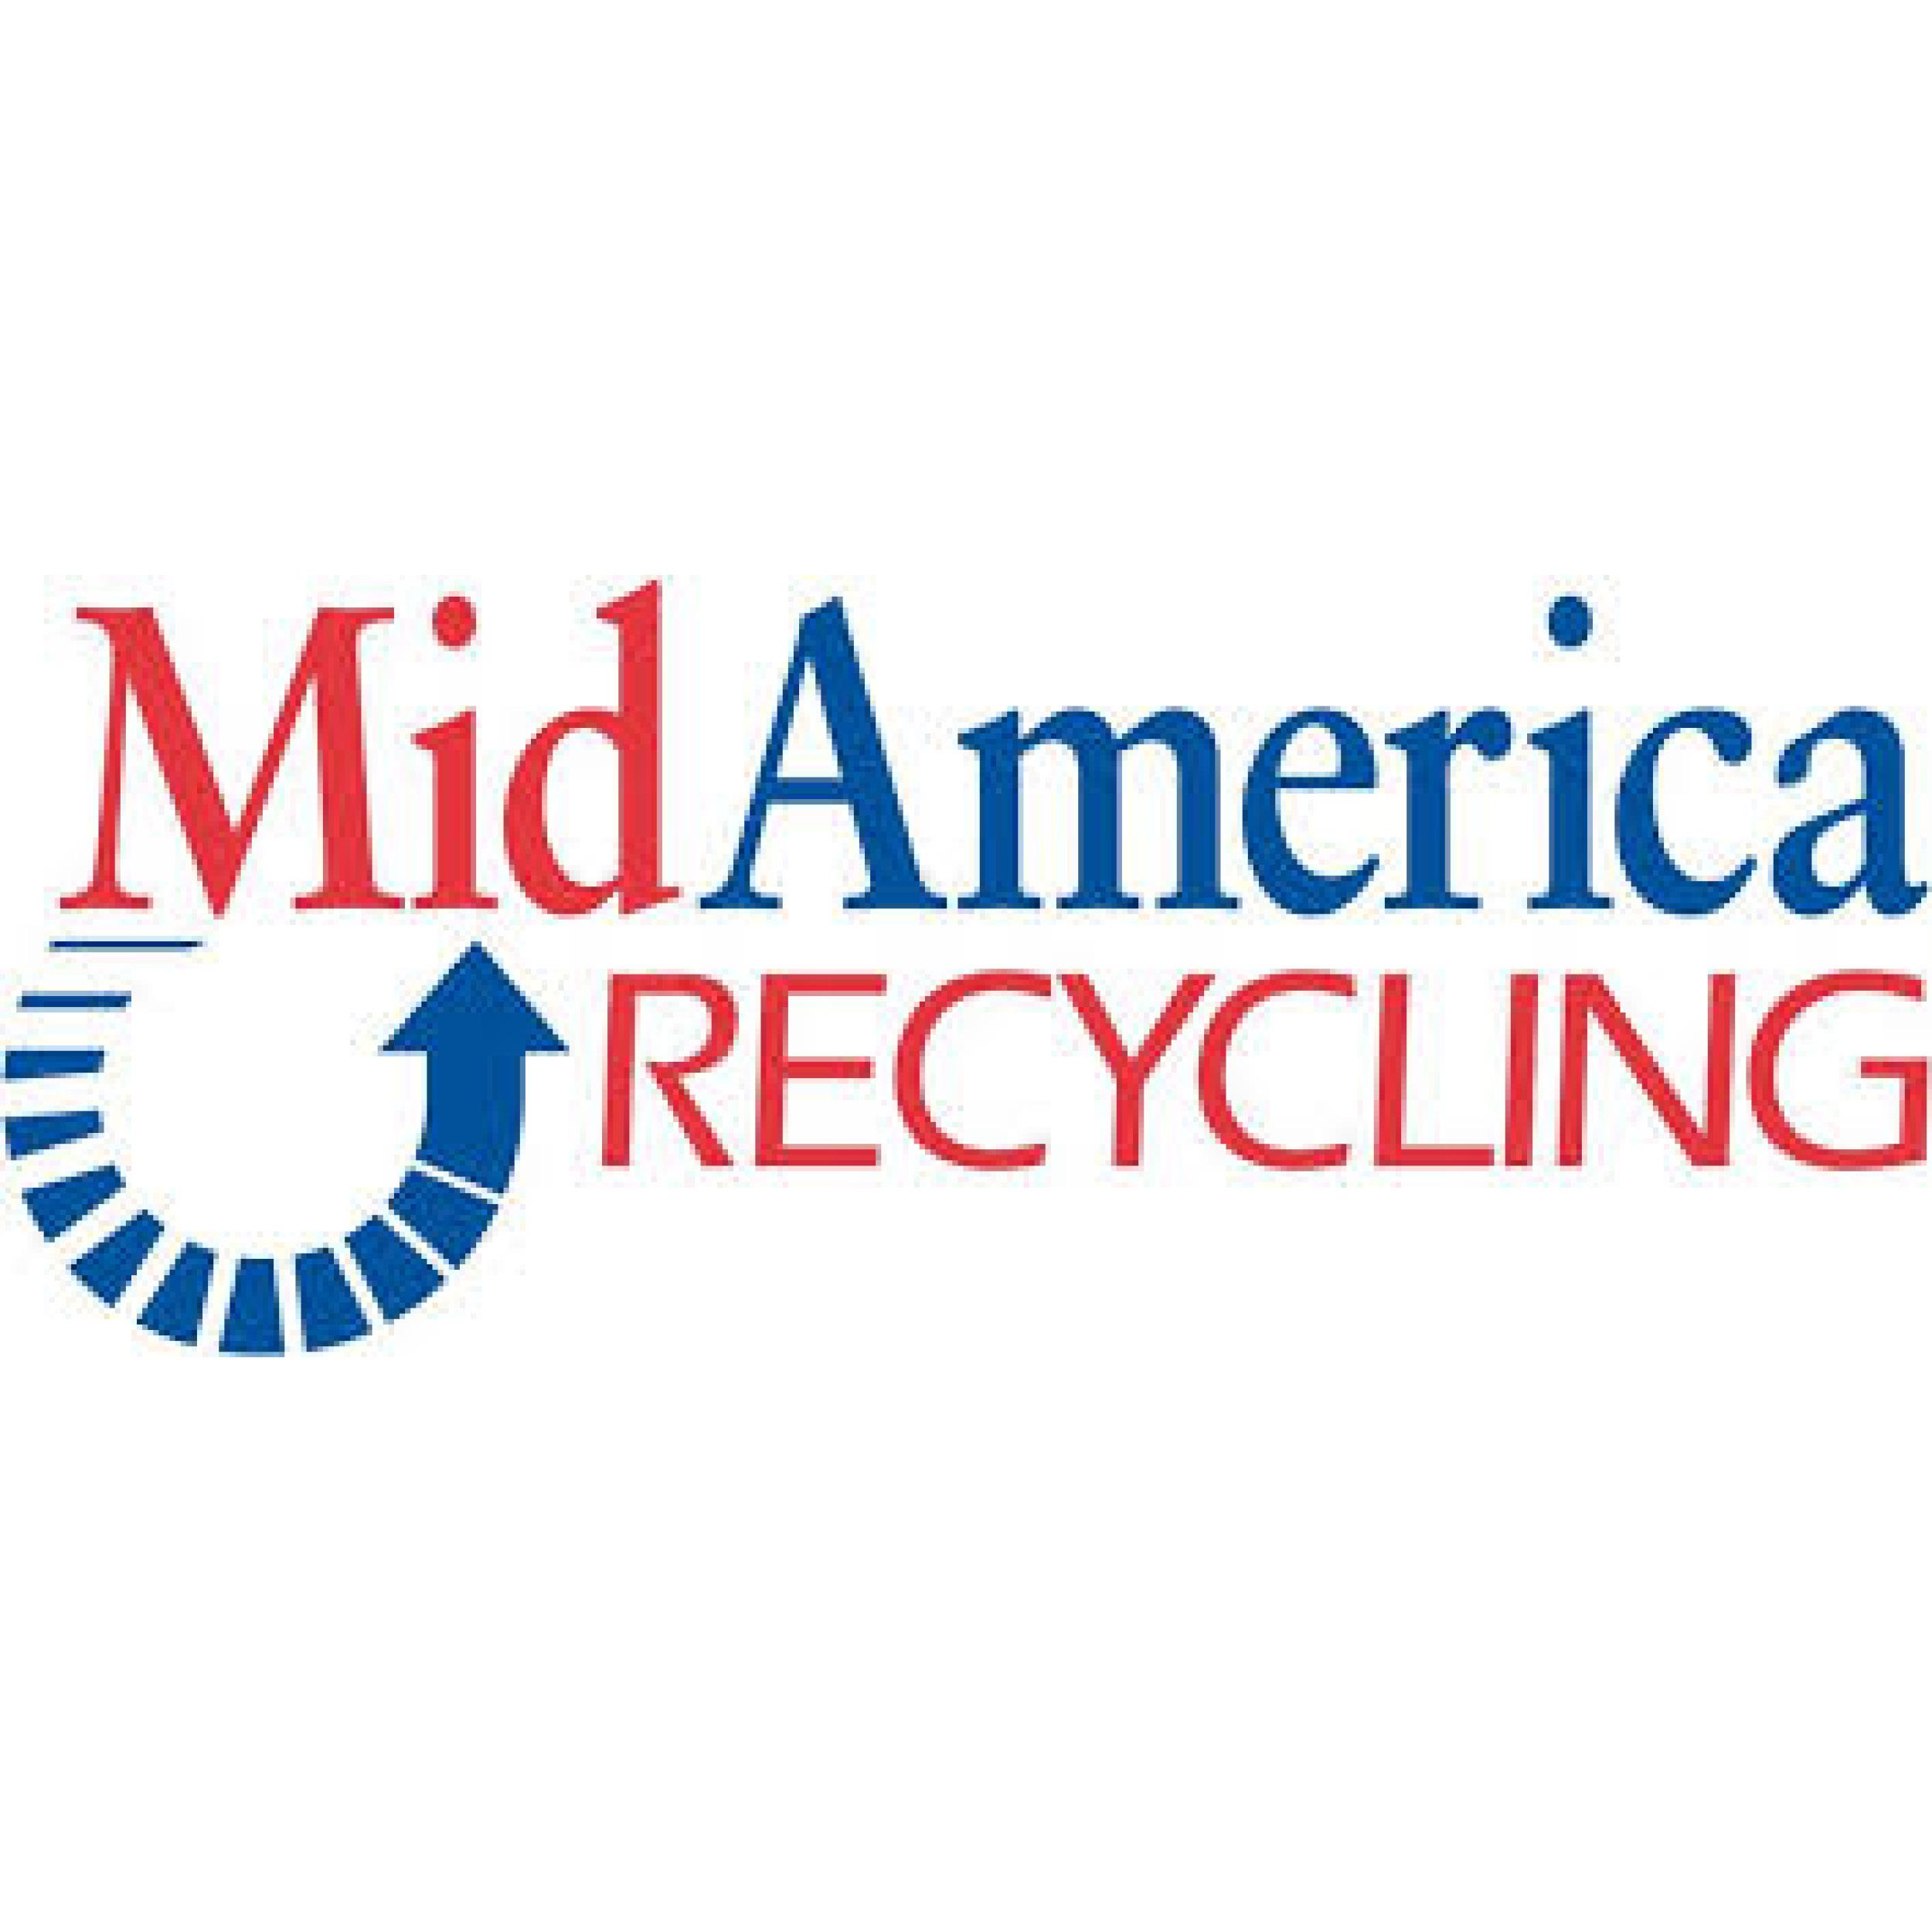 MidAmerica Recycling logo